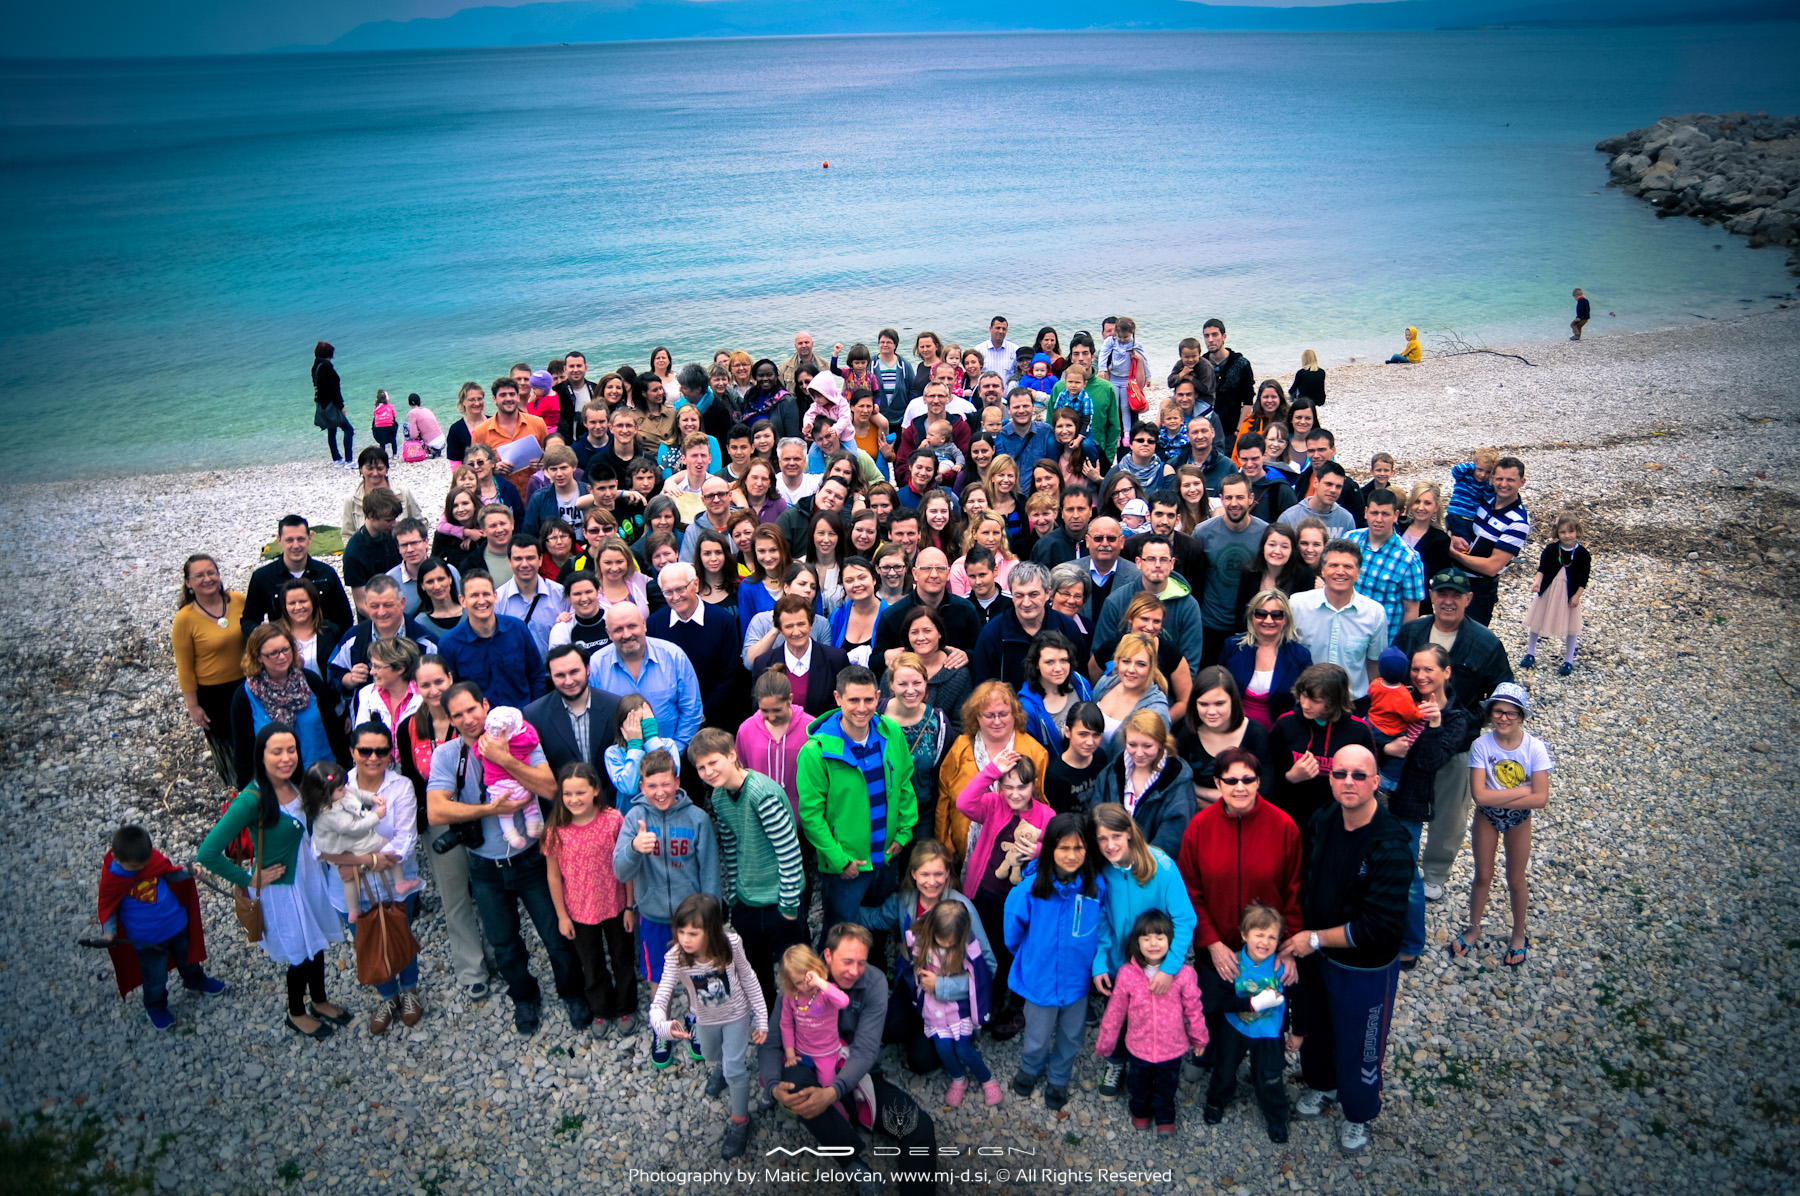 20140406  DSC77131 - Two baptisms in Crikvenica, 6.4.2014